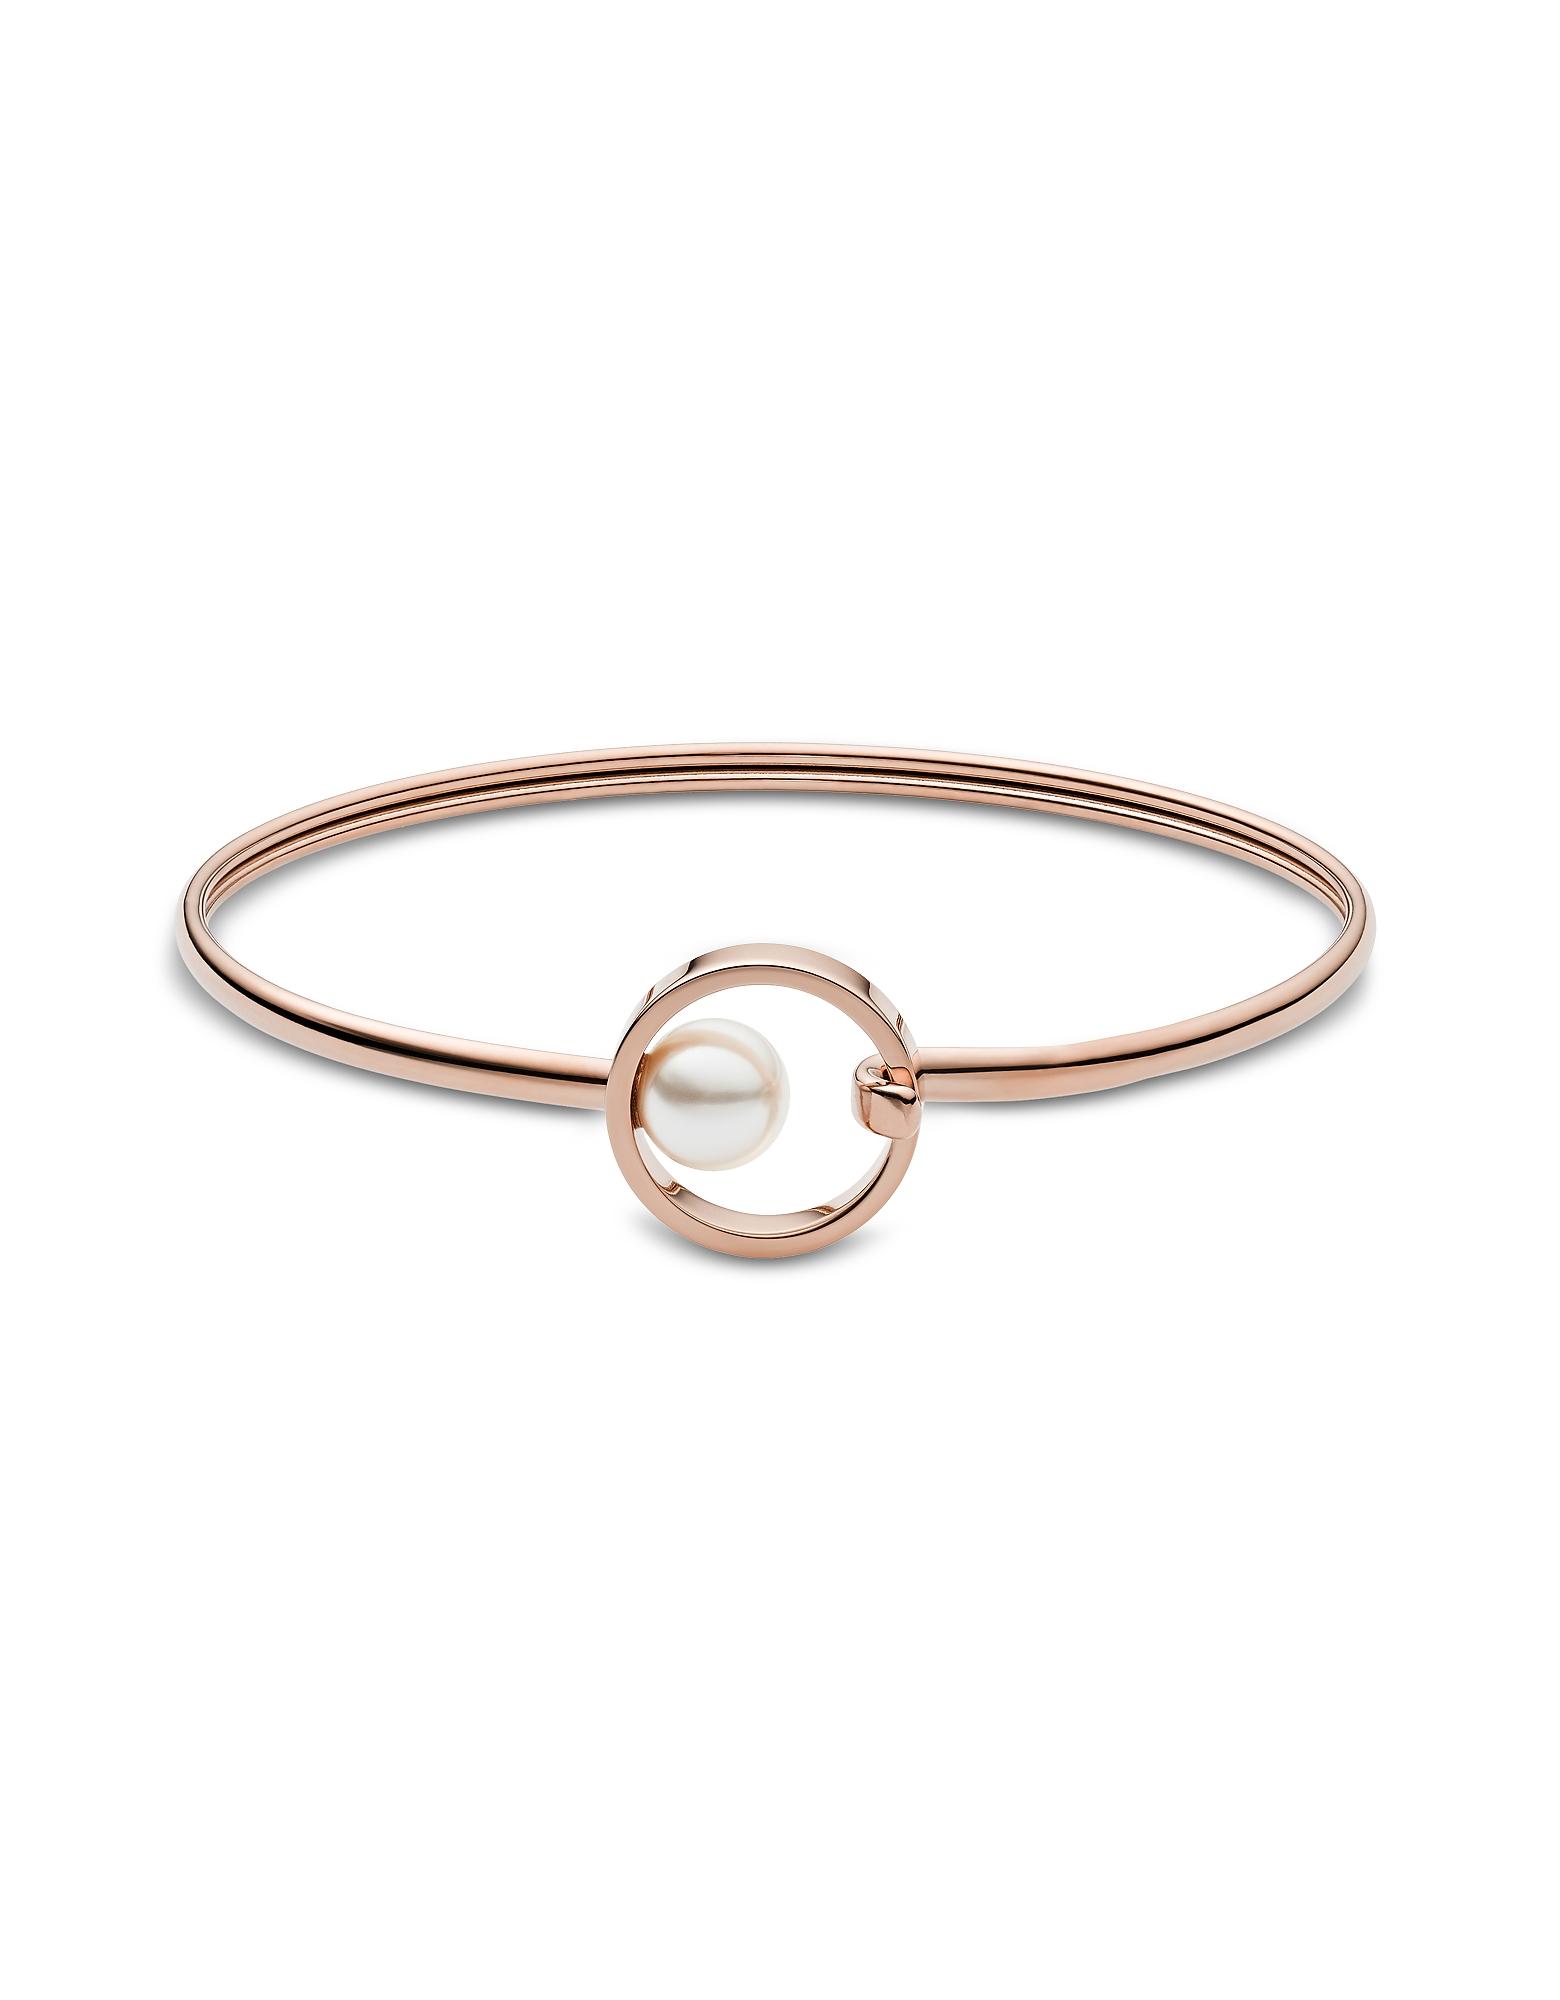 Skagen Bracelets, Agnethe Rose Tone Pearl Clasp Bangle